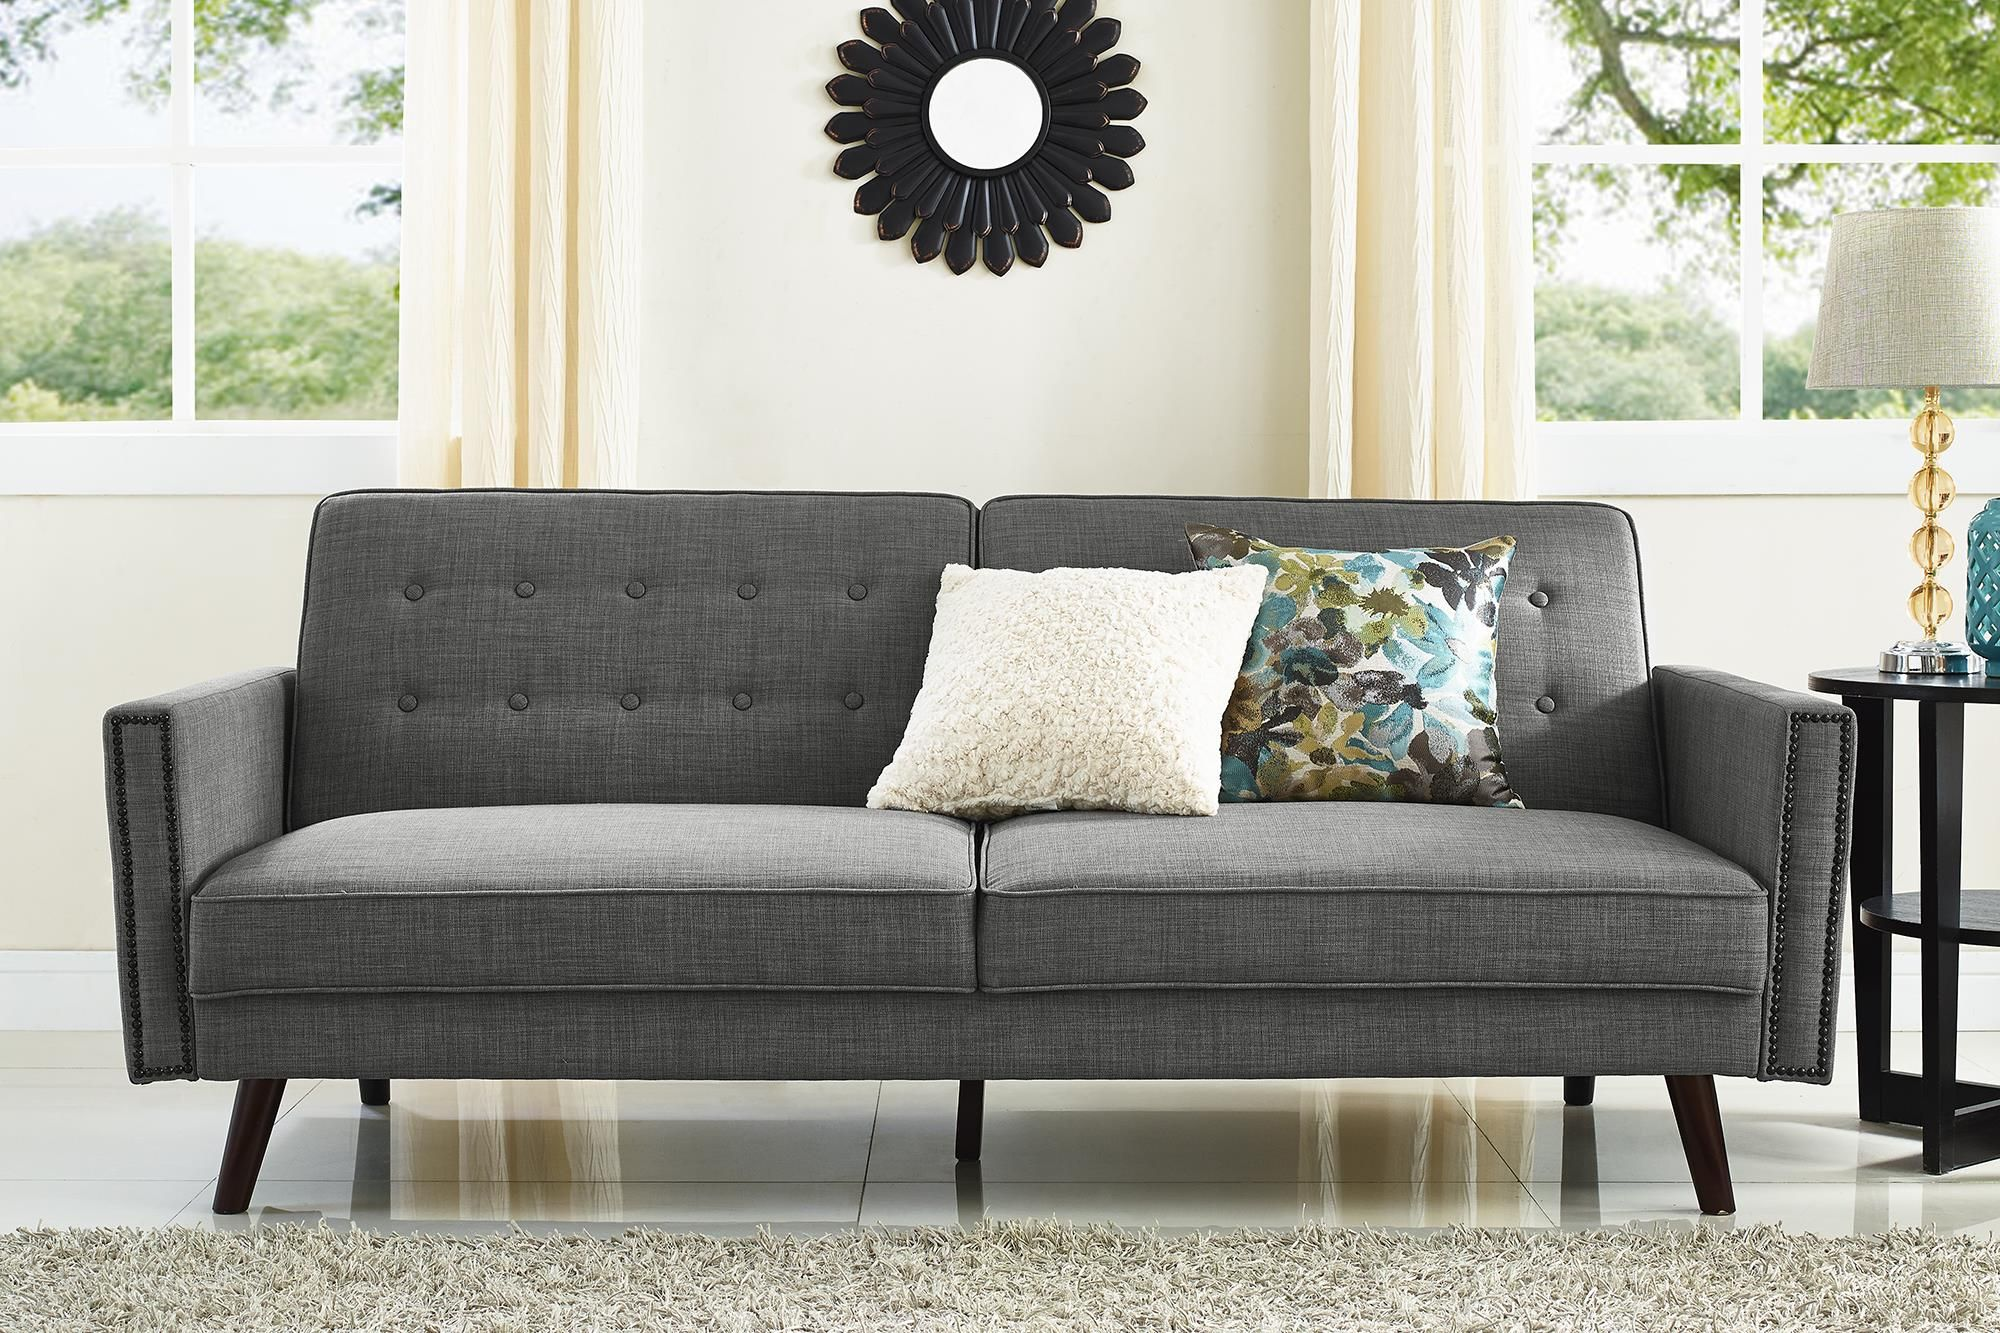 Better Homes and Gardens Rowan Sofa Bed, Gray Walmart